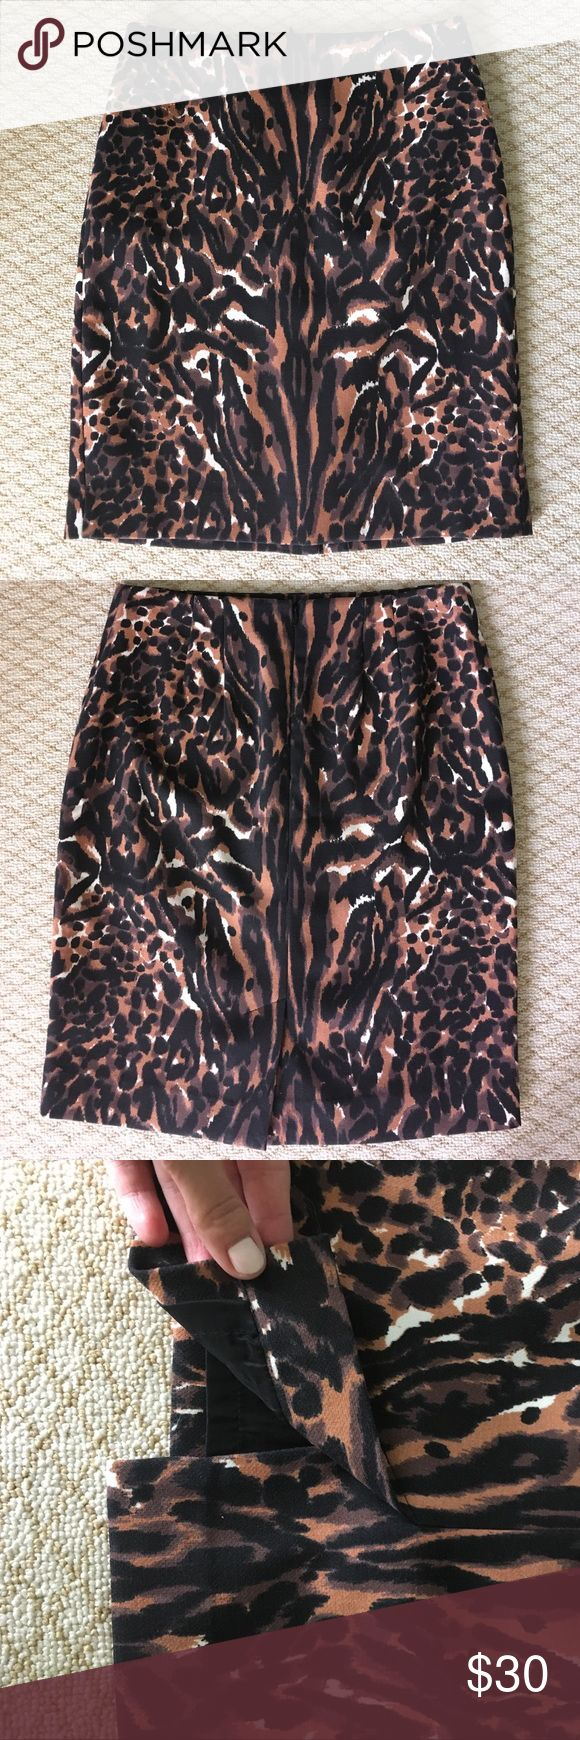 Talbots cheetah skirt Cheetah/wild black white orange pencil skirt, lined, zip back. Perfect condition. Talbots Skirts